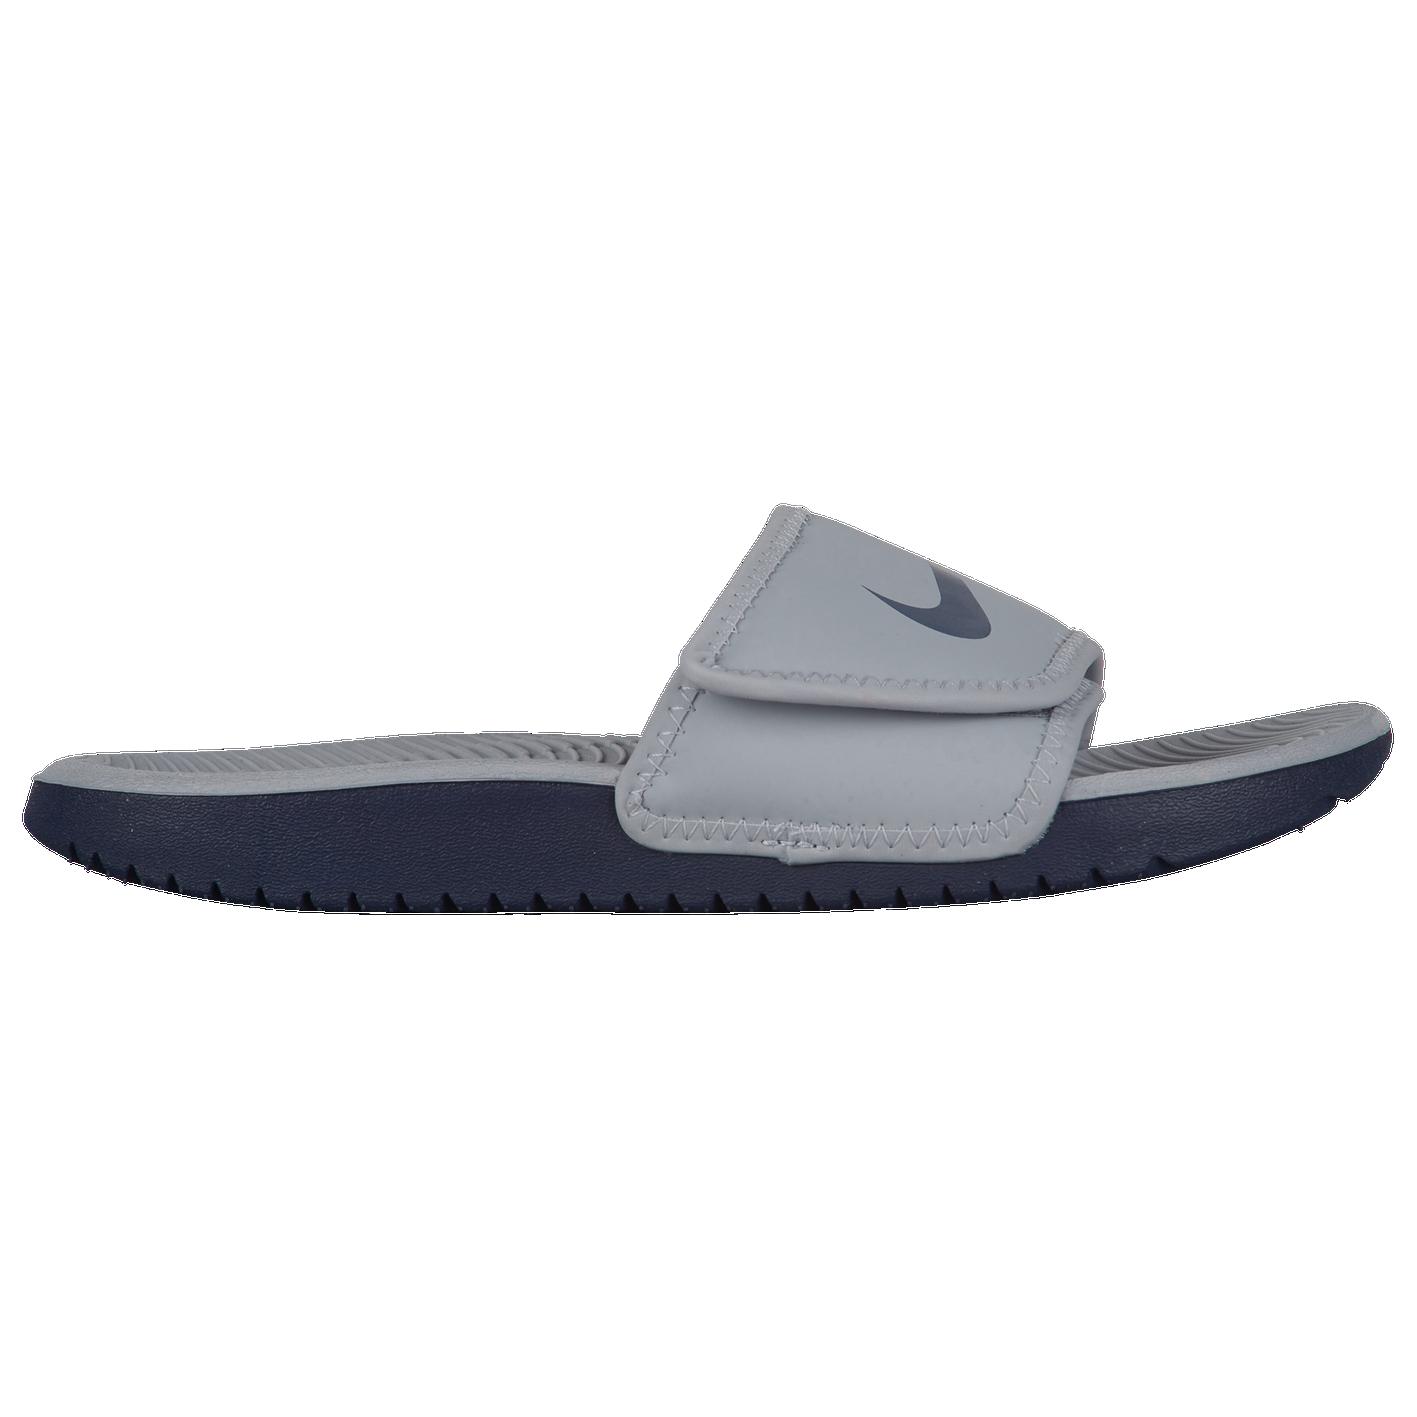 b57eabb1ef74 Nike Kawa Adjust Slide - Boys  Grade School - Casual - Shoes - Wolf ...